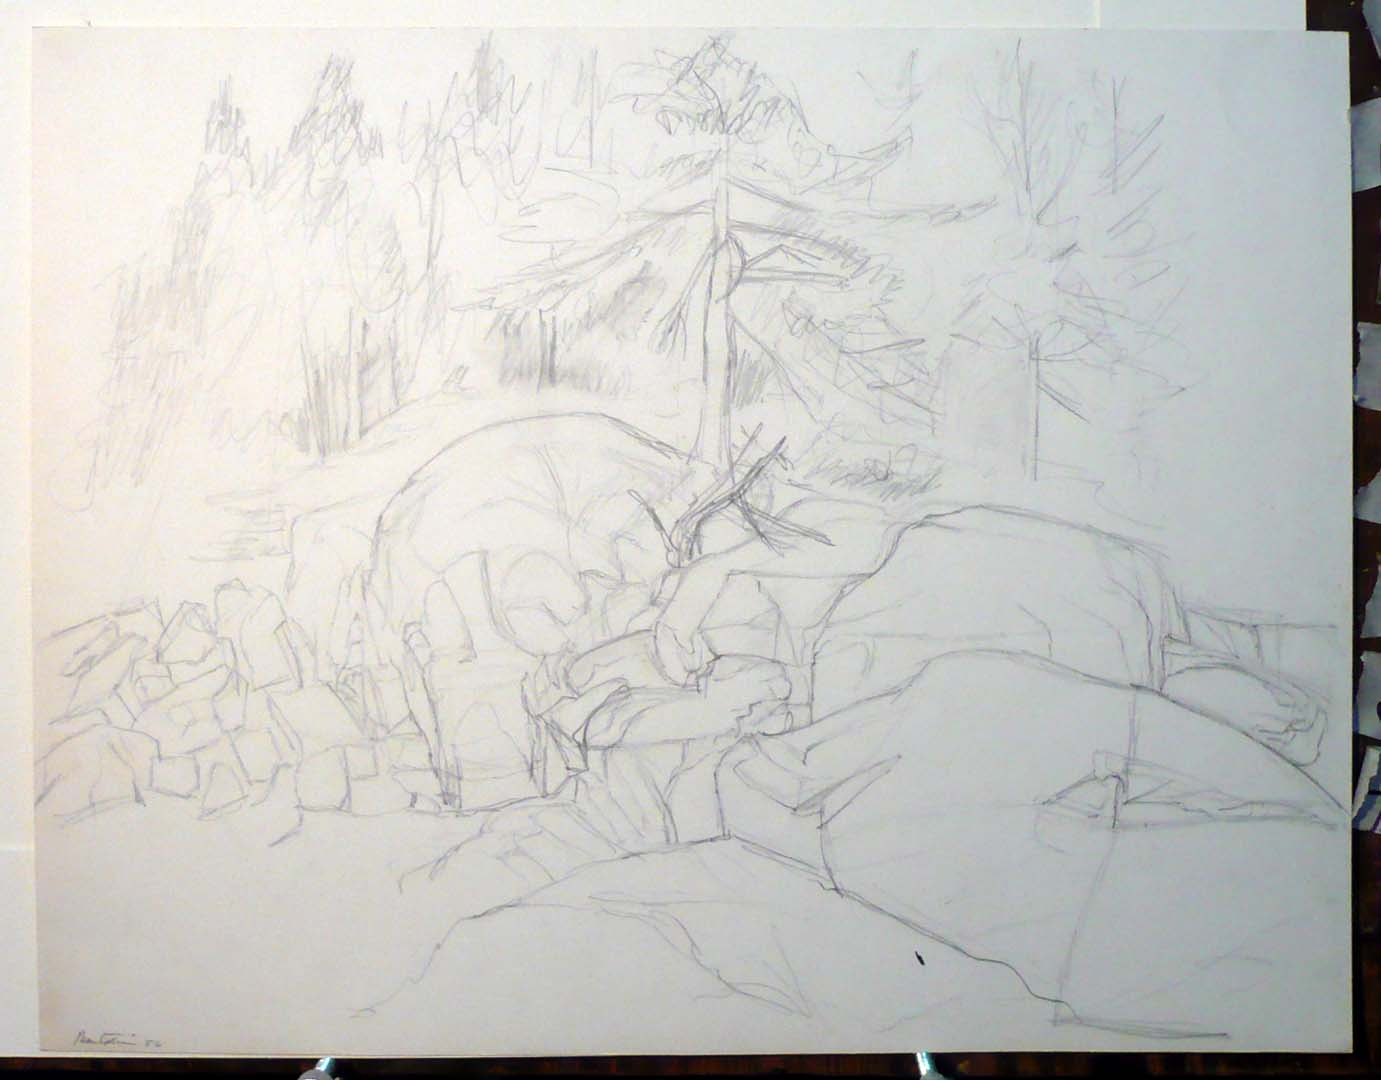 1956 Deer Isle Shore Pencil on Paper 16.875 x 21.625